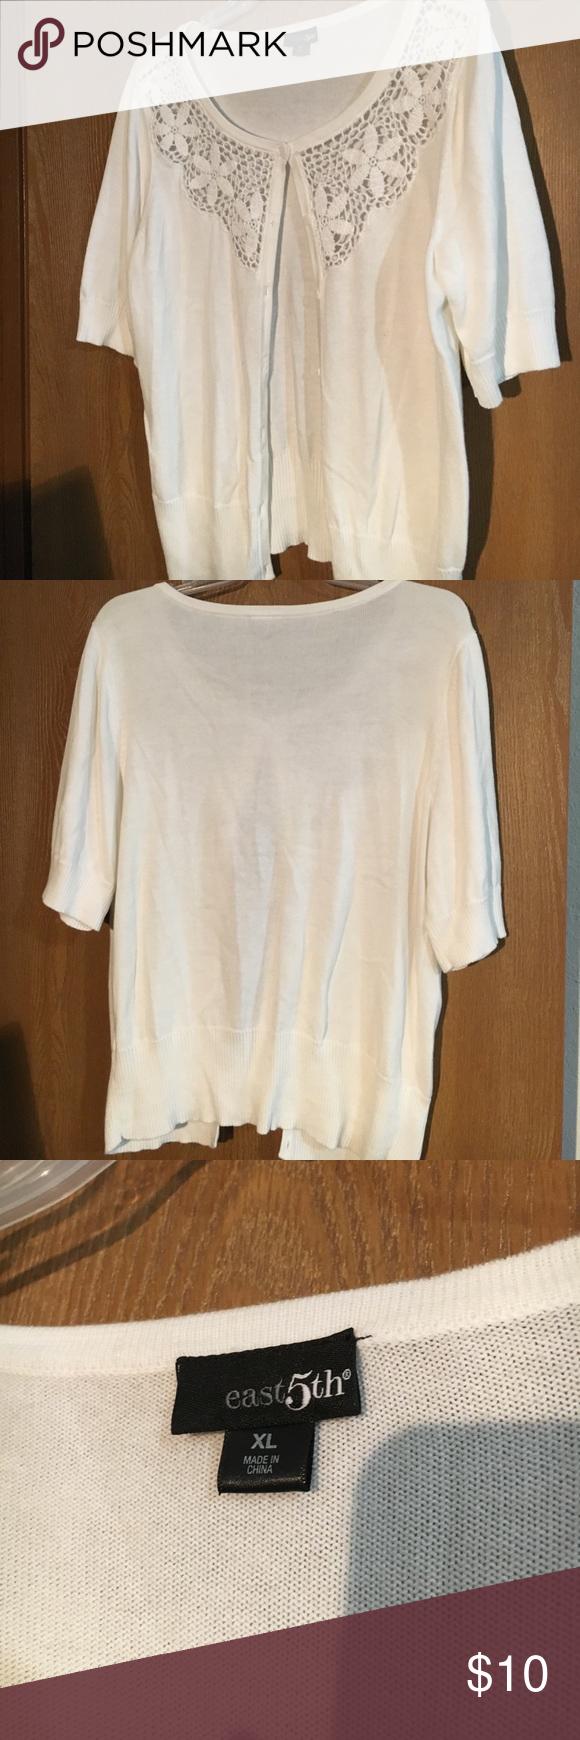 White short sleeve shrug/sweater. White short sleeve shrug/sweater. XL. Light weight East 5th Sweaters Shrugs & Ponchos